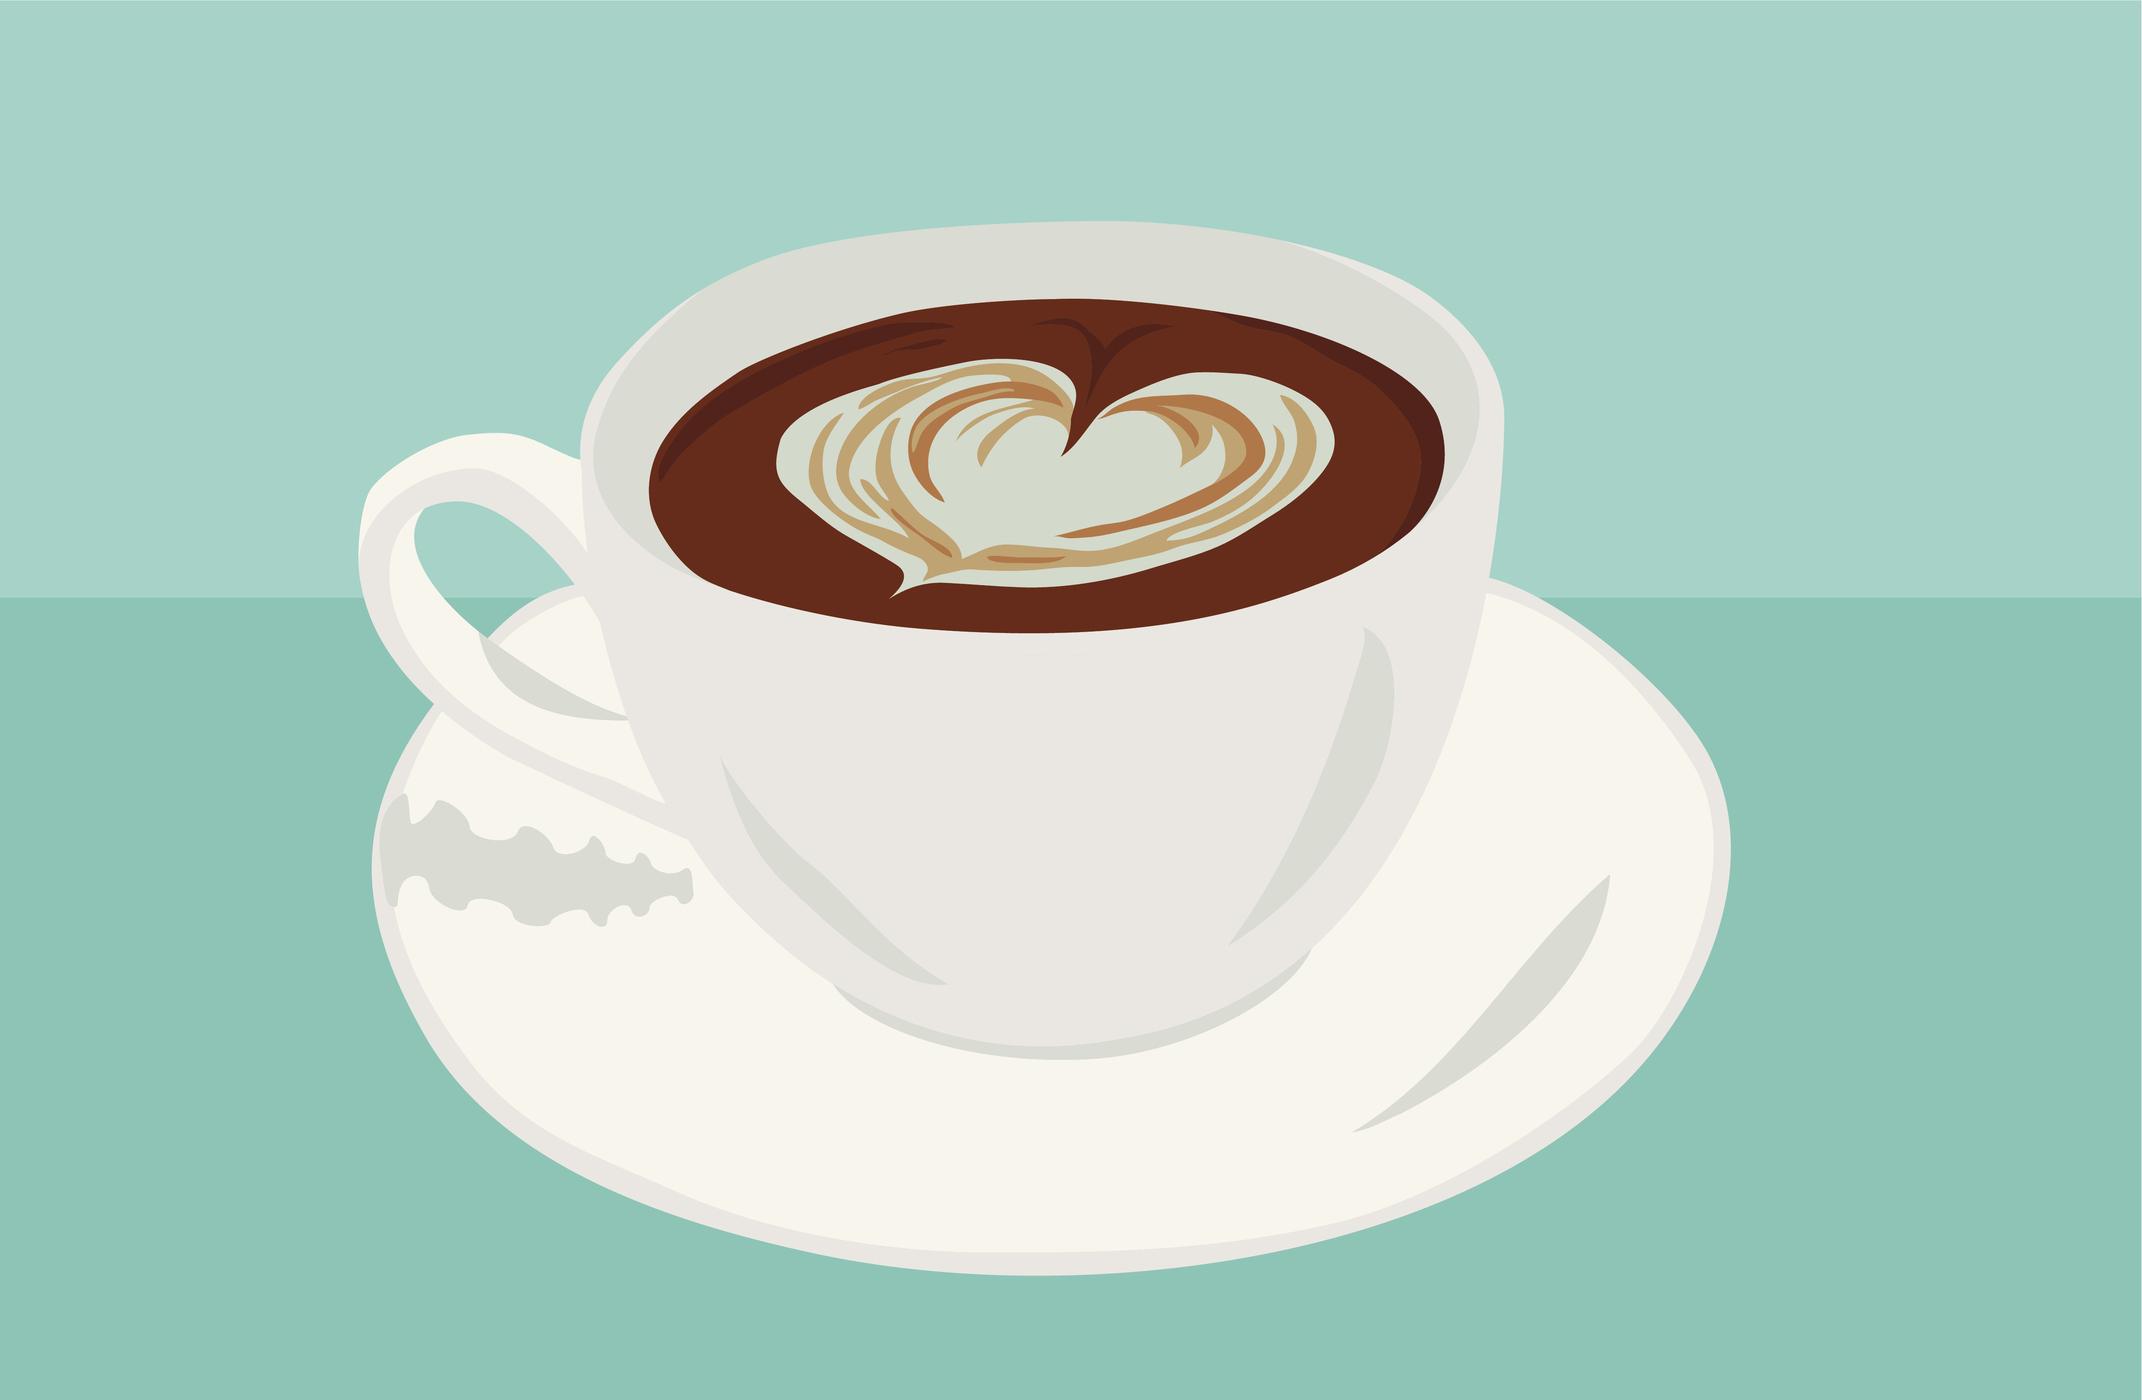 heart shape in coffee vector illustration